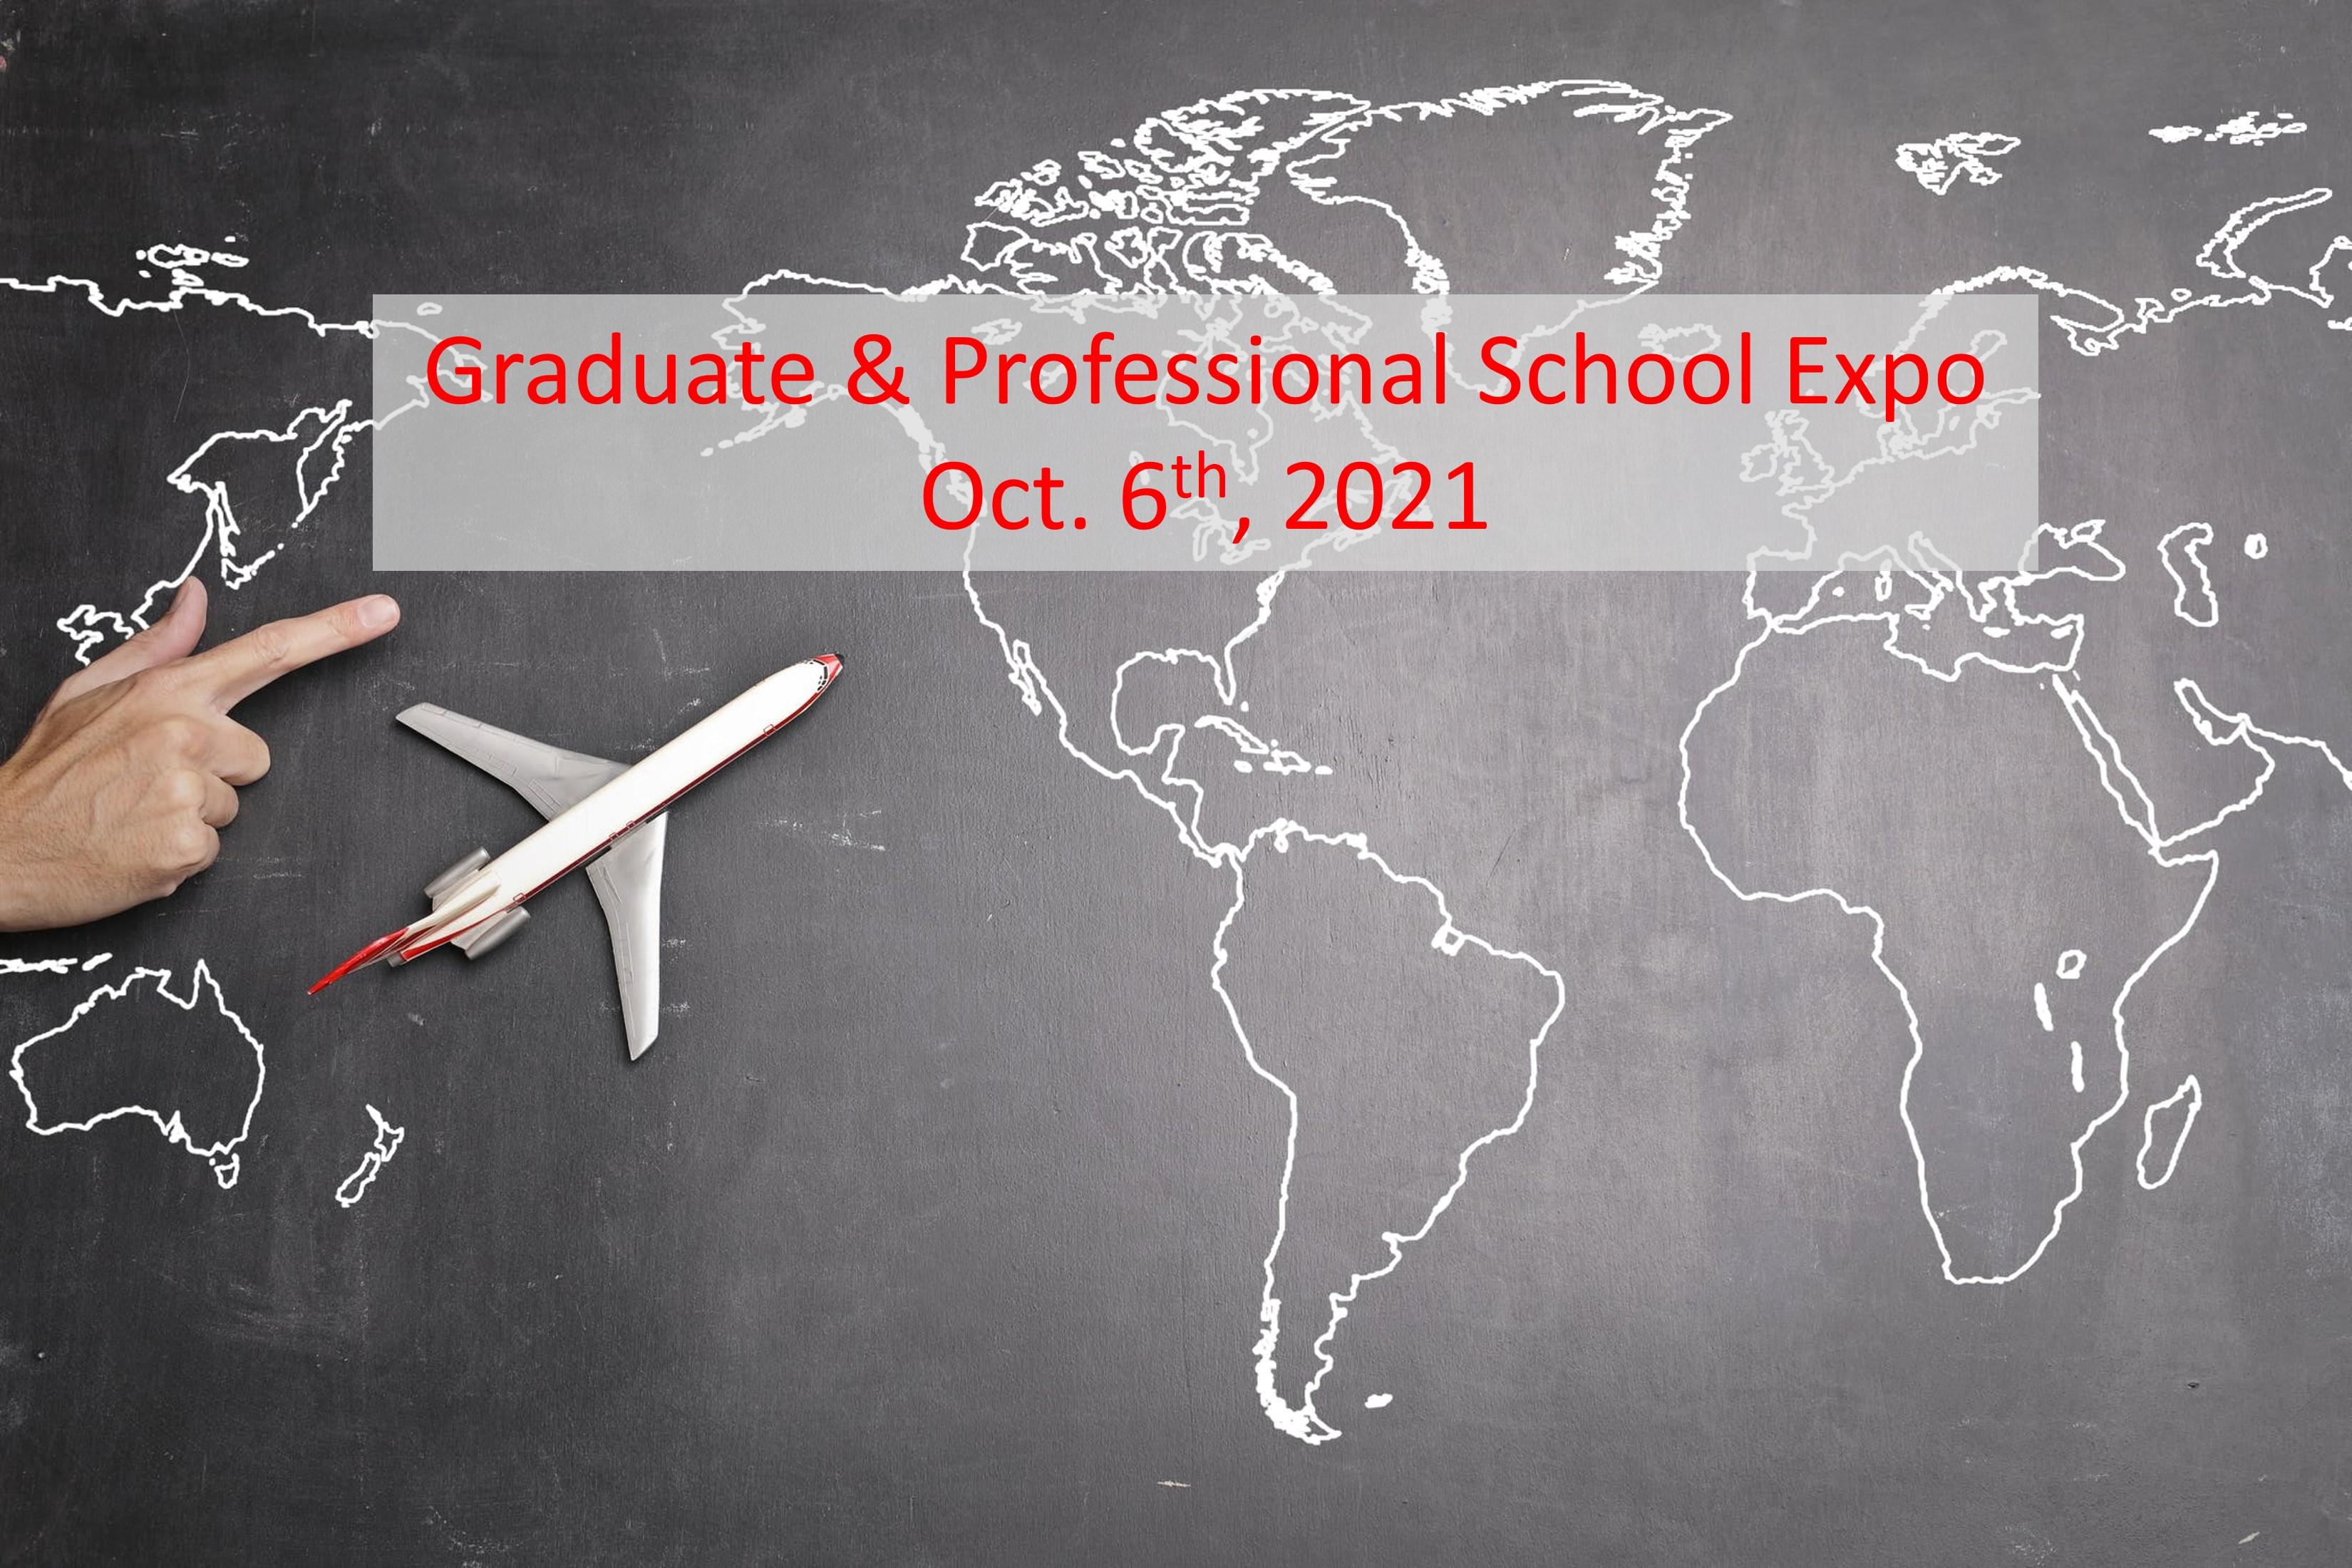 Graduate & Professional School Expo Icon